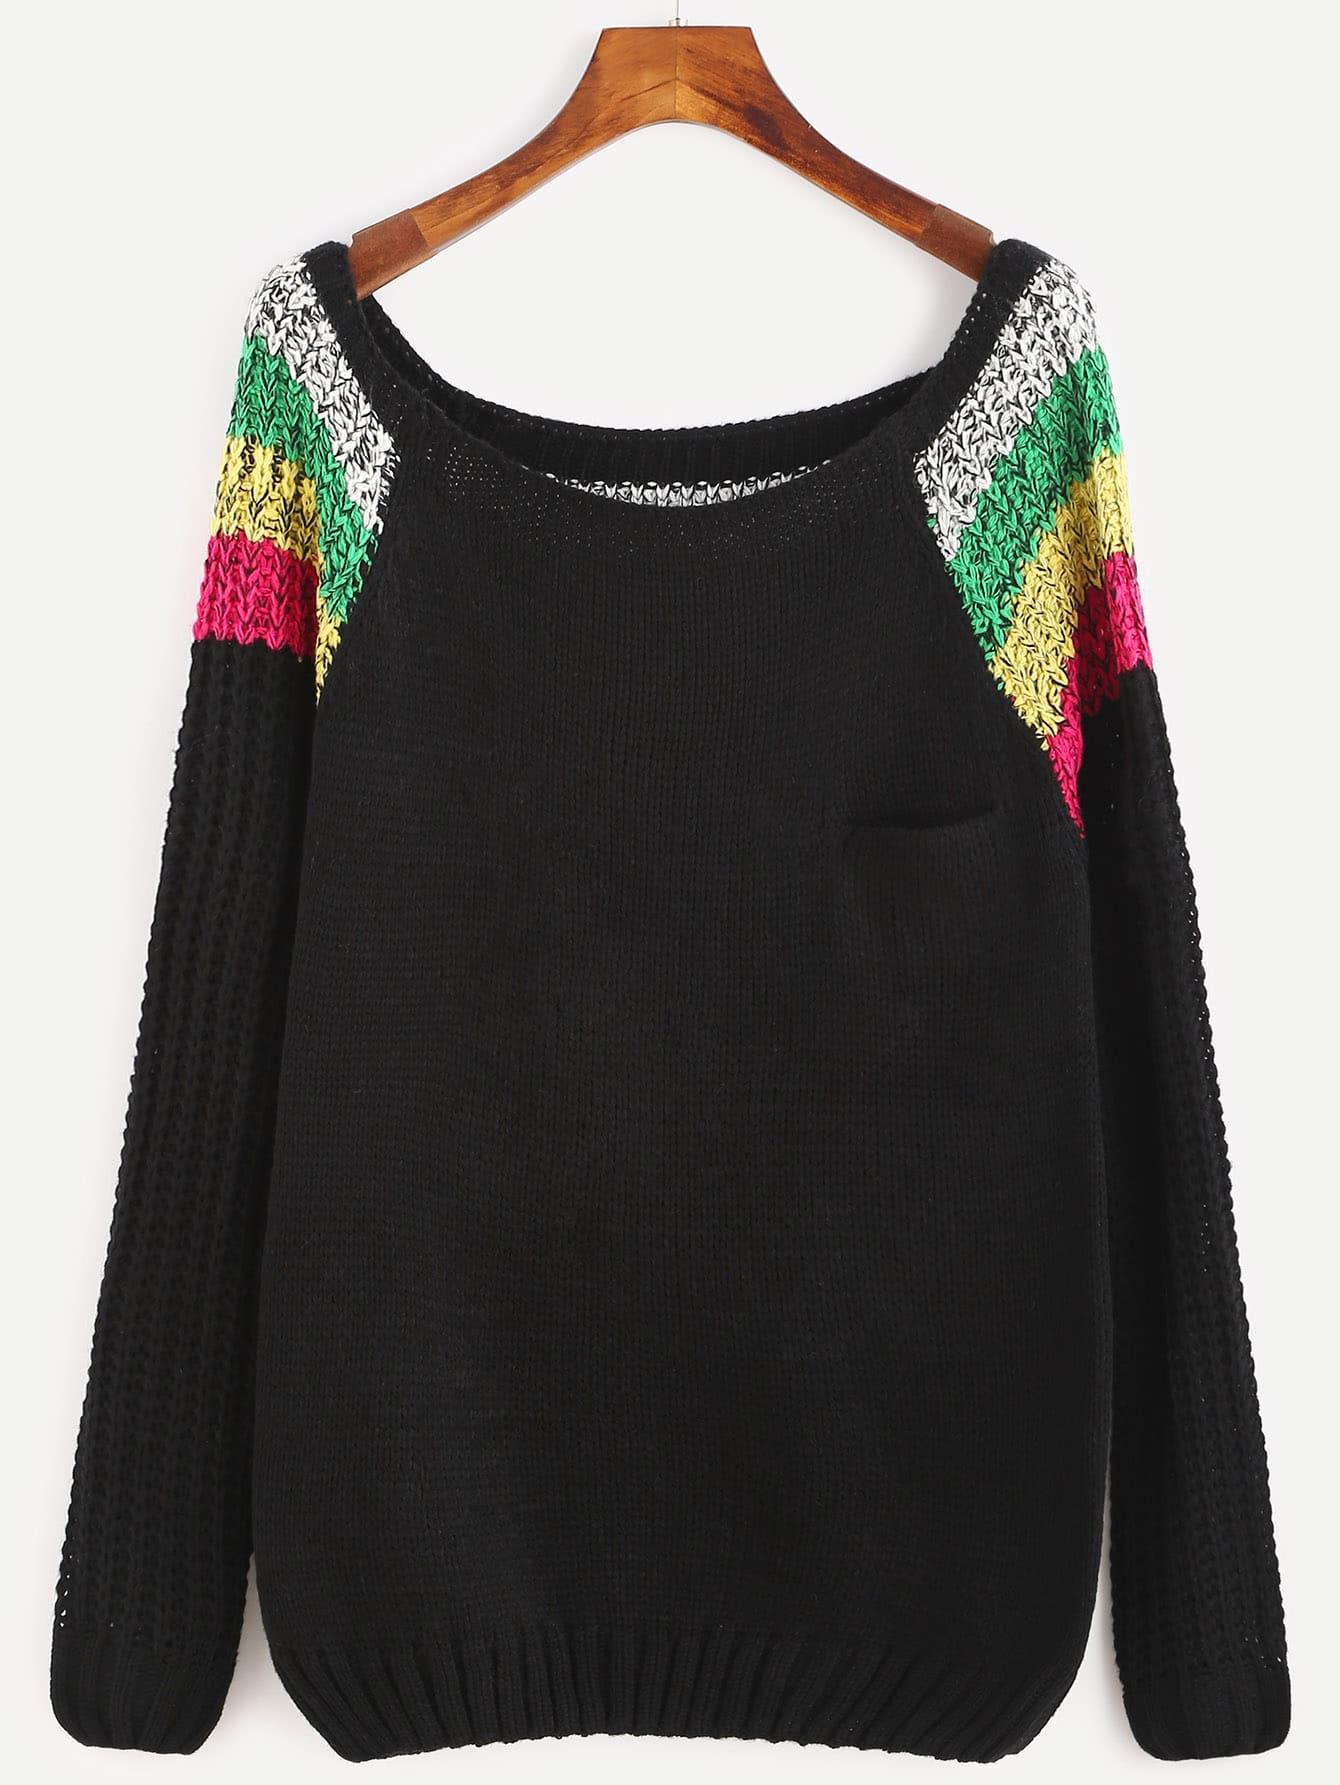 Color Block Scoop Neck Raglan Sleeve SweaterColor Block Scoop Neck Raglan Sleeve Sweater<br><br>color: Black<br>size: one-size